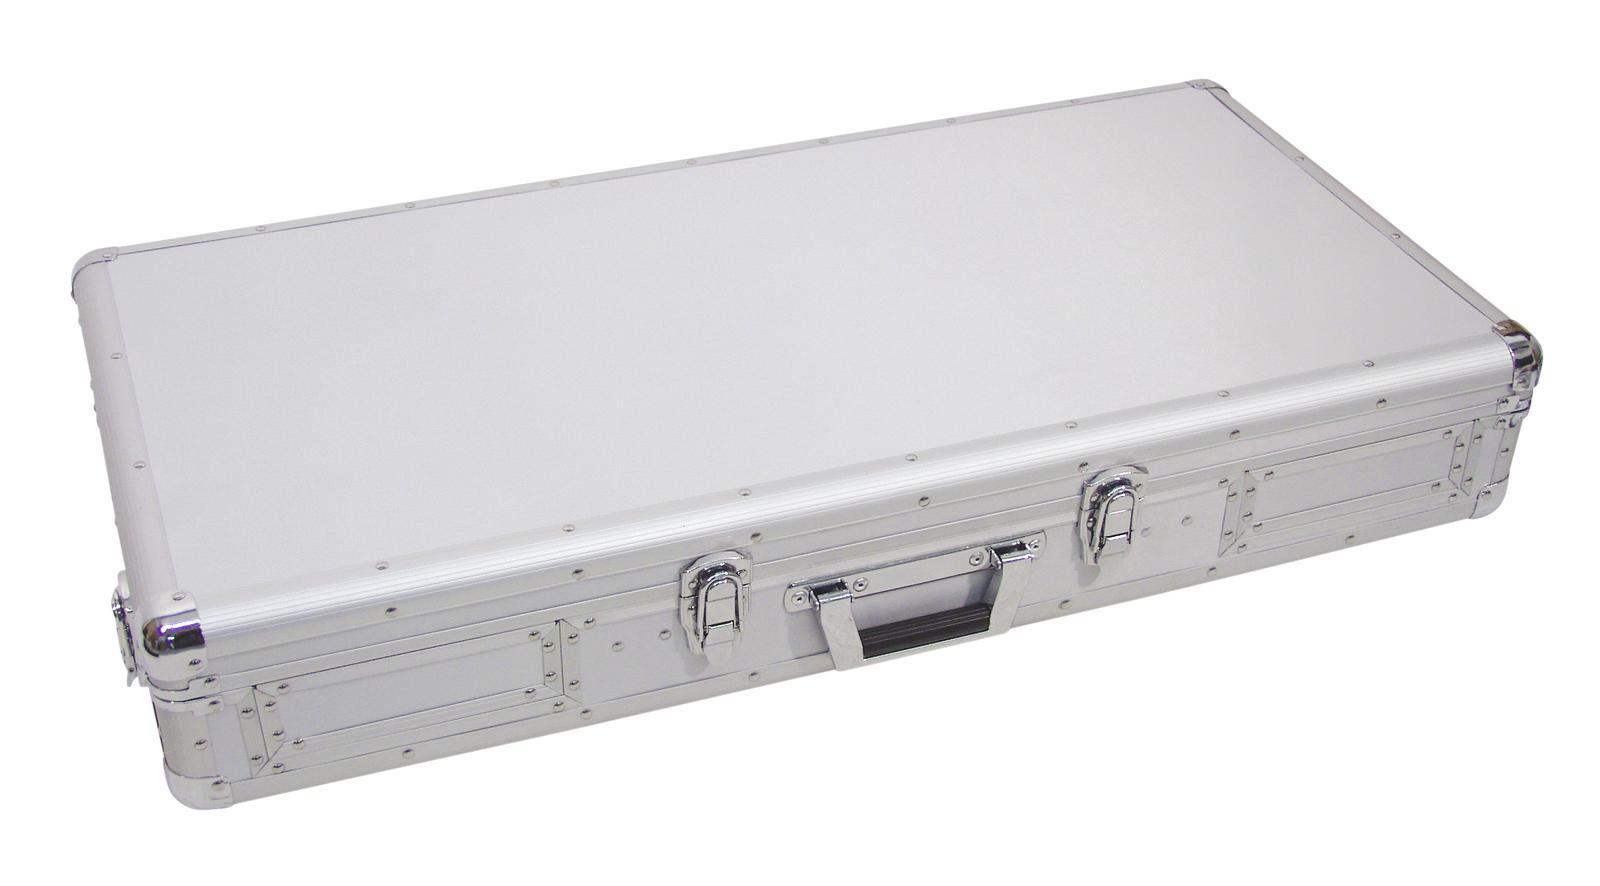 Flight Case Custodia Per Console Cdj Mixer Pc ROADINGER DIGI-1 2xCD/1xM-12 sil